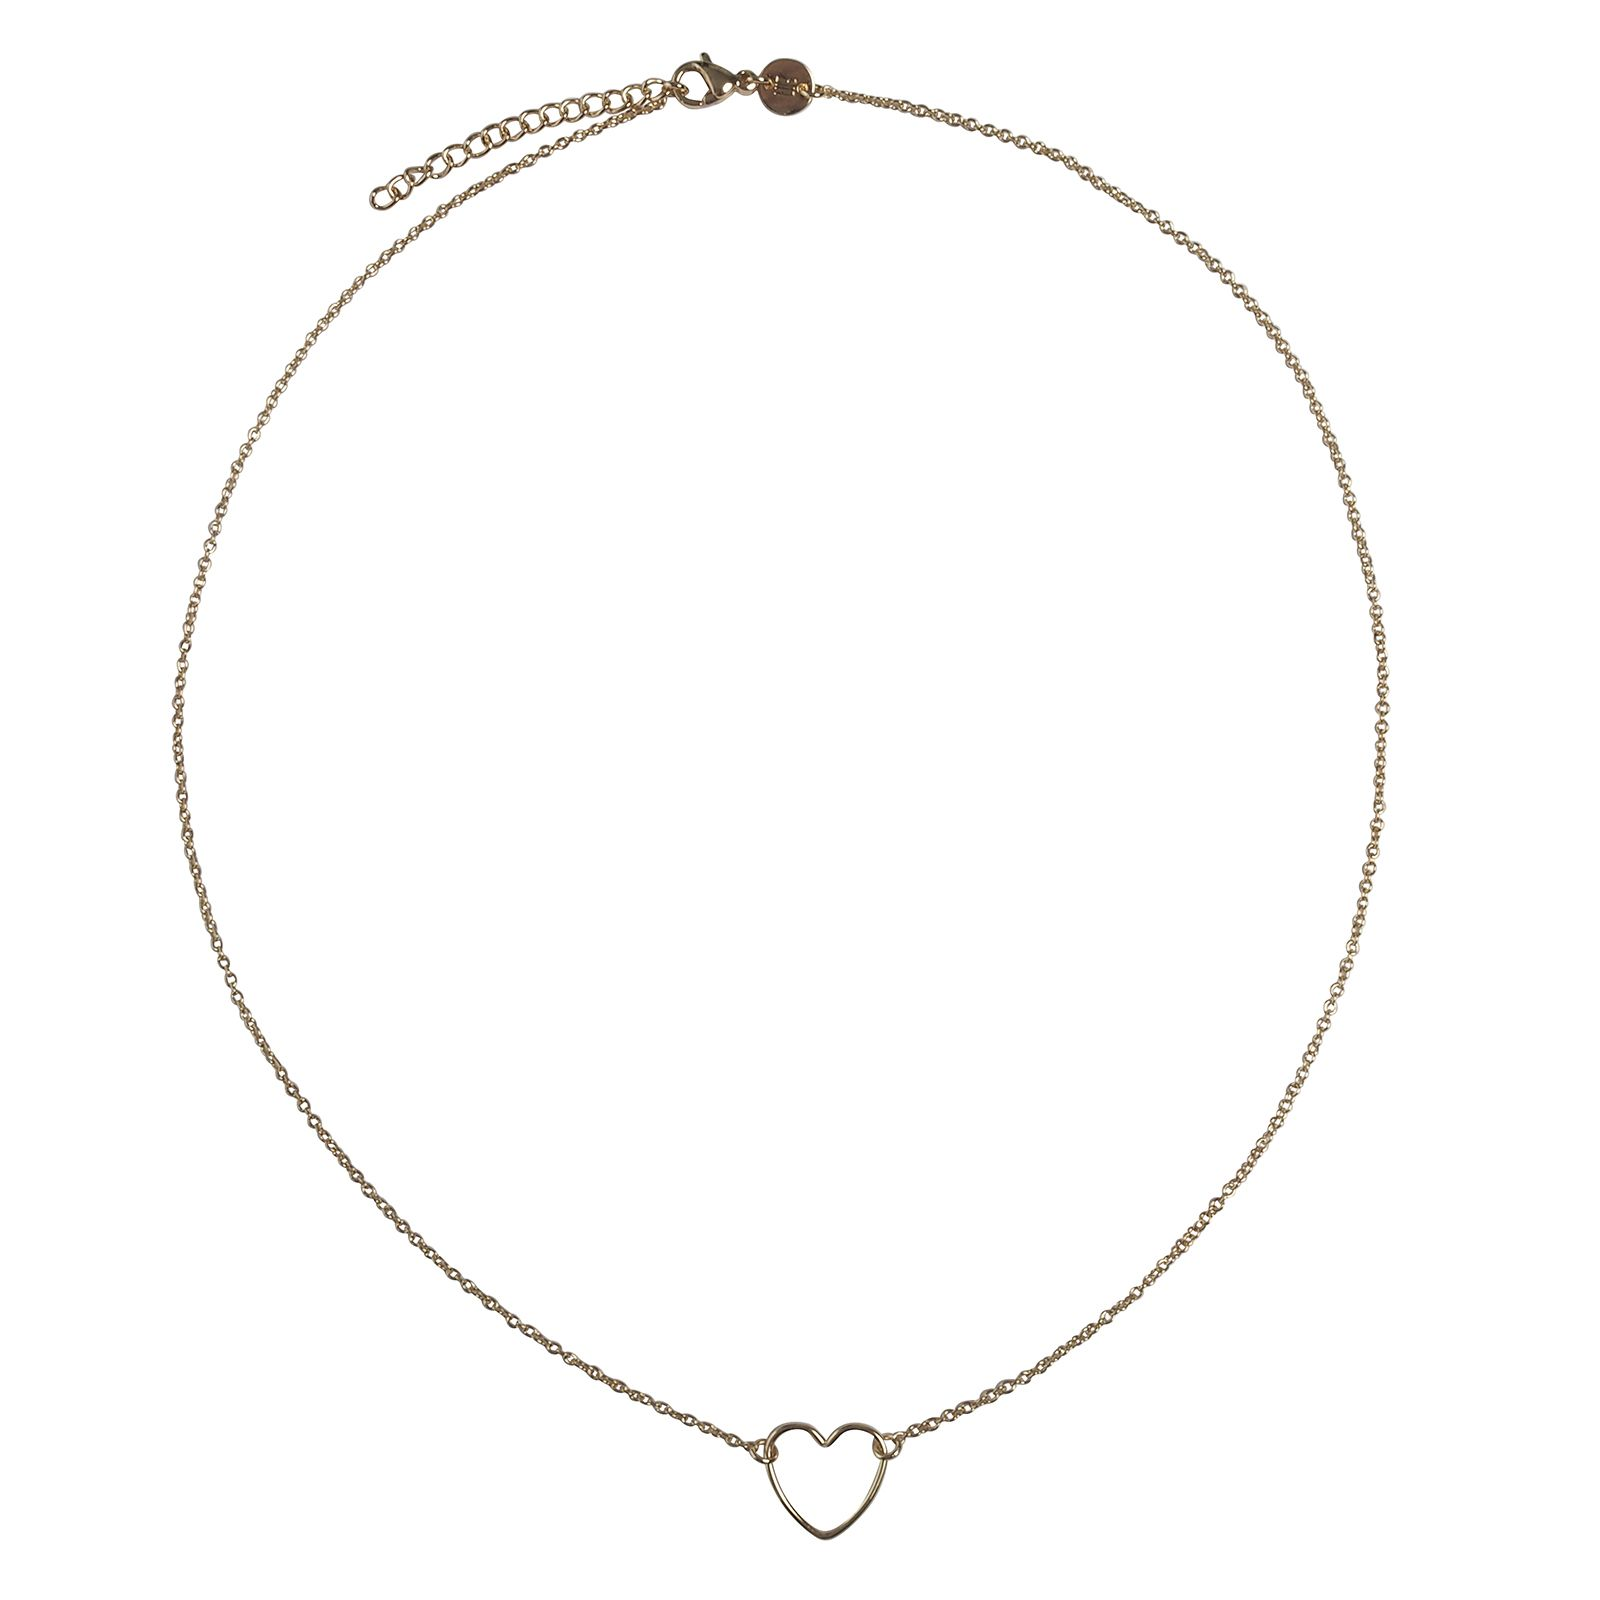 LUZ handmade heart ketting goud